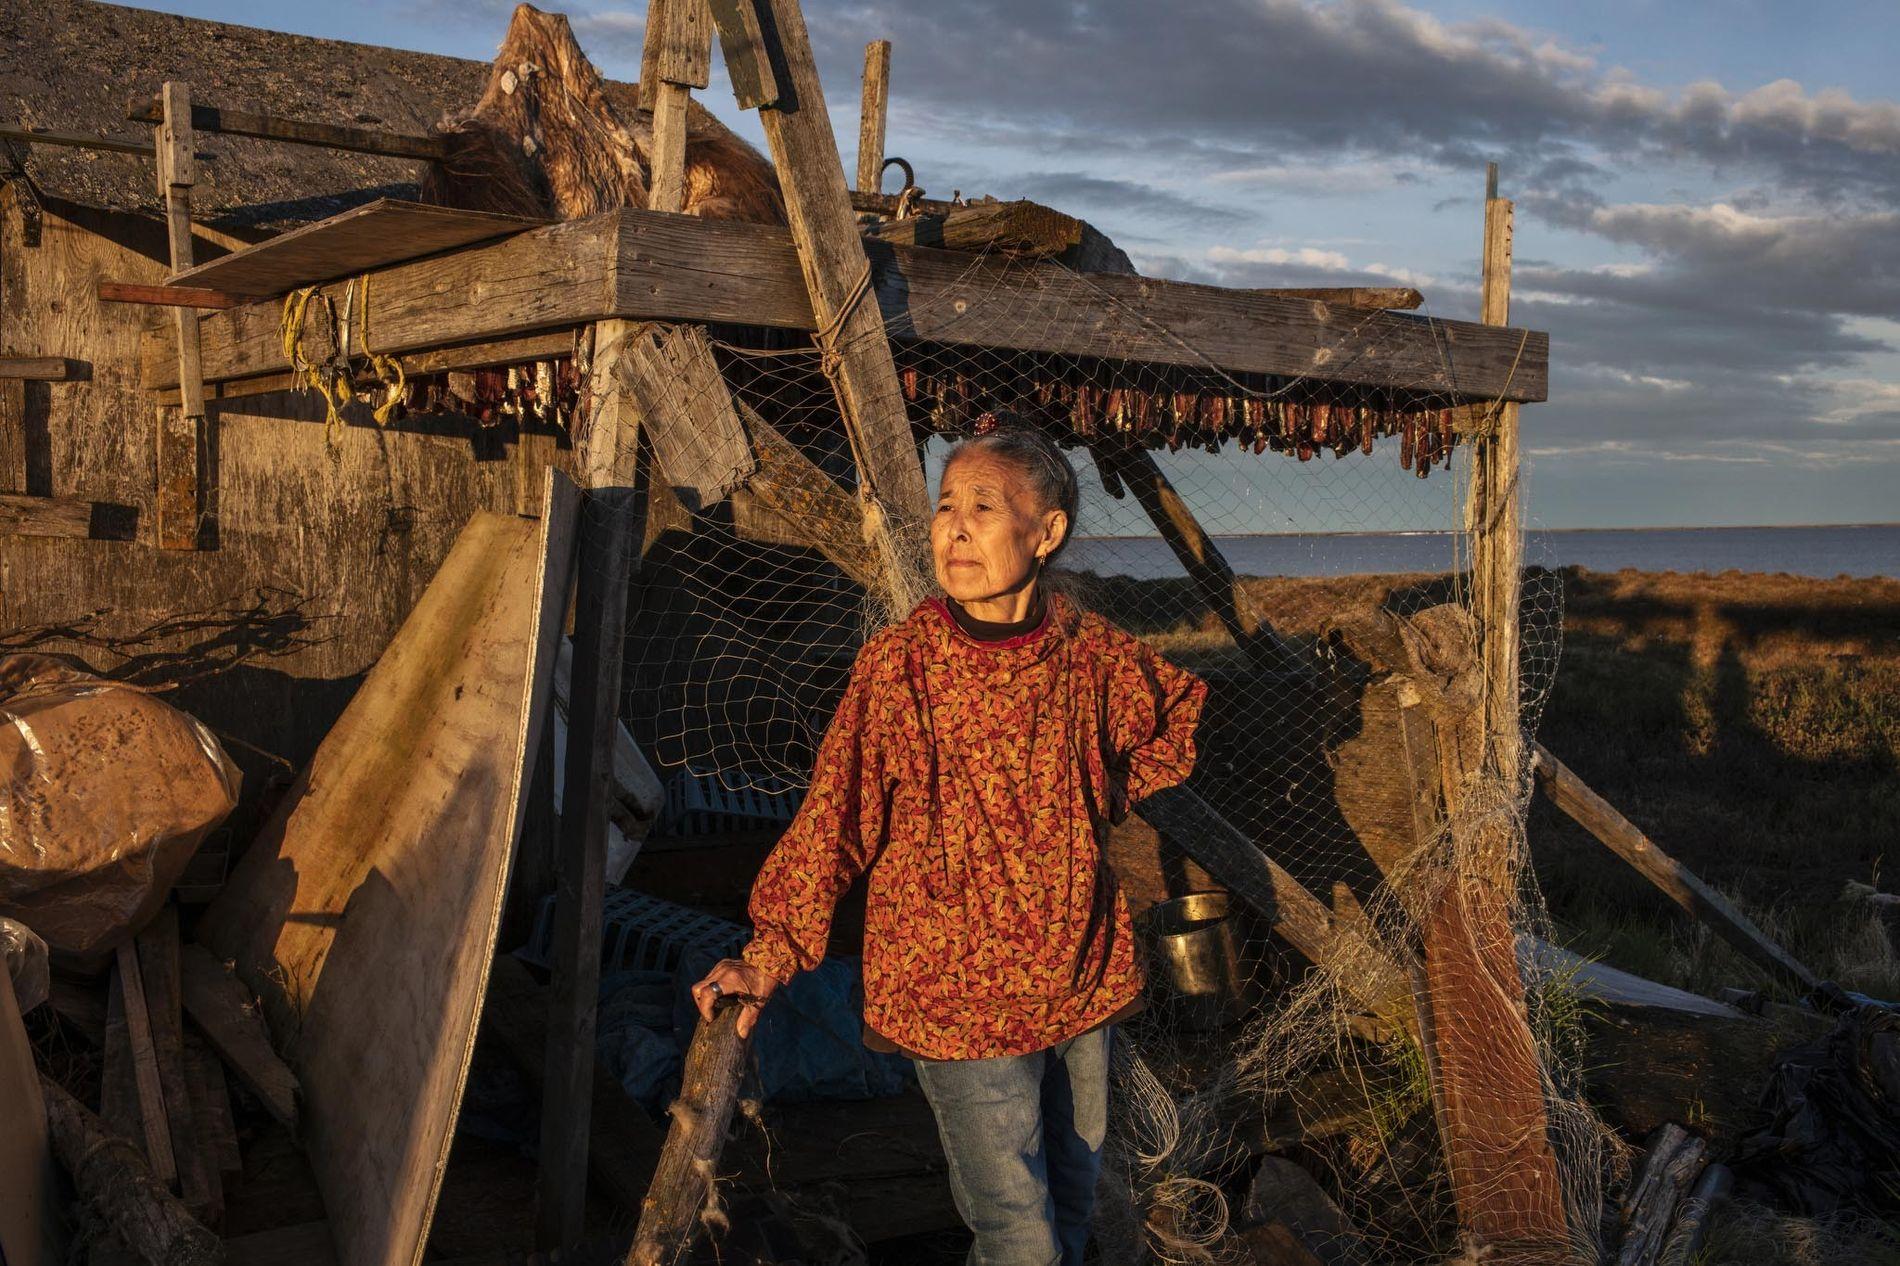 Monica Kasayuli dries herring in Newtok before moving to the new village of Mertarvik.